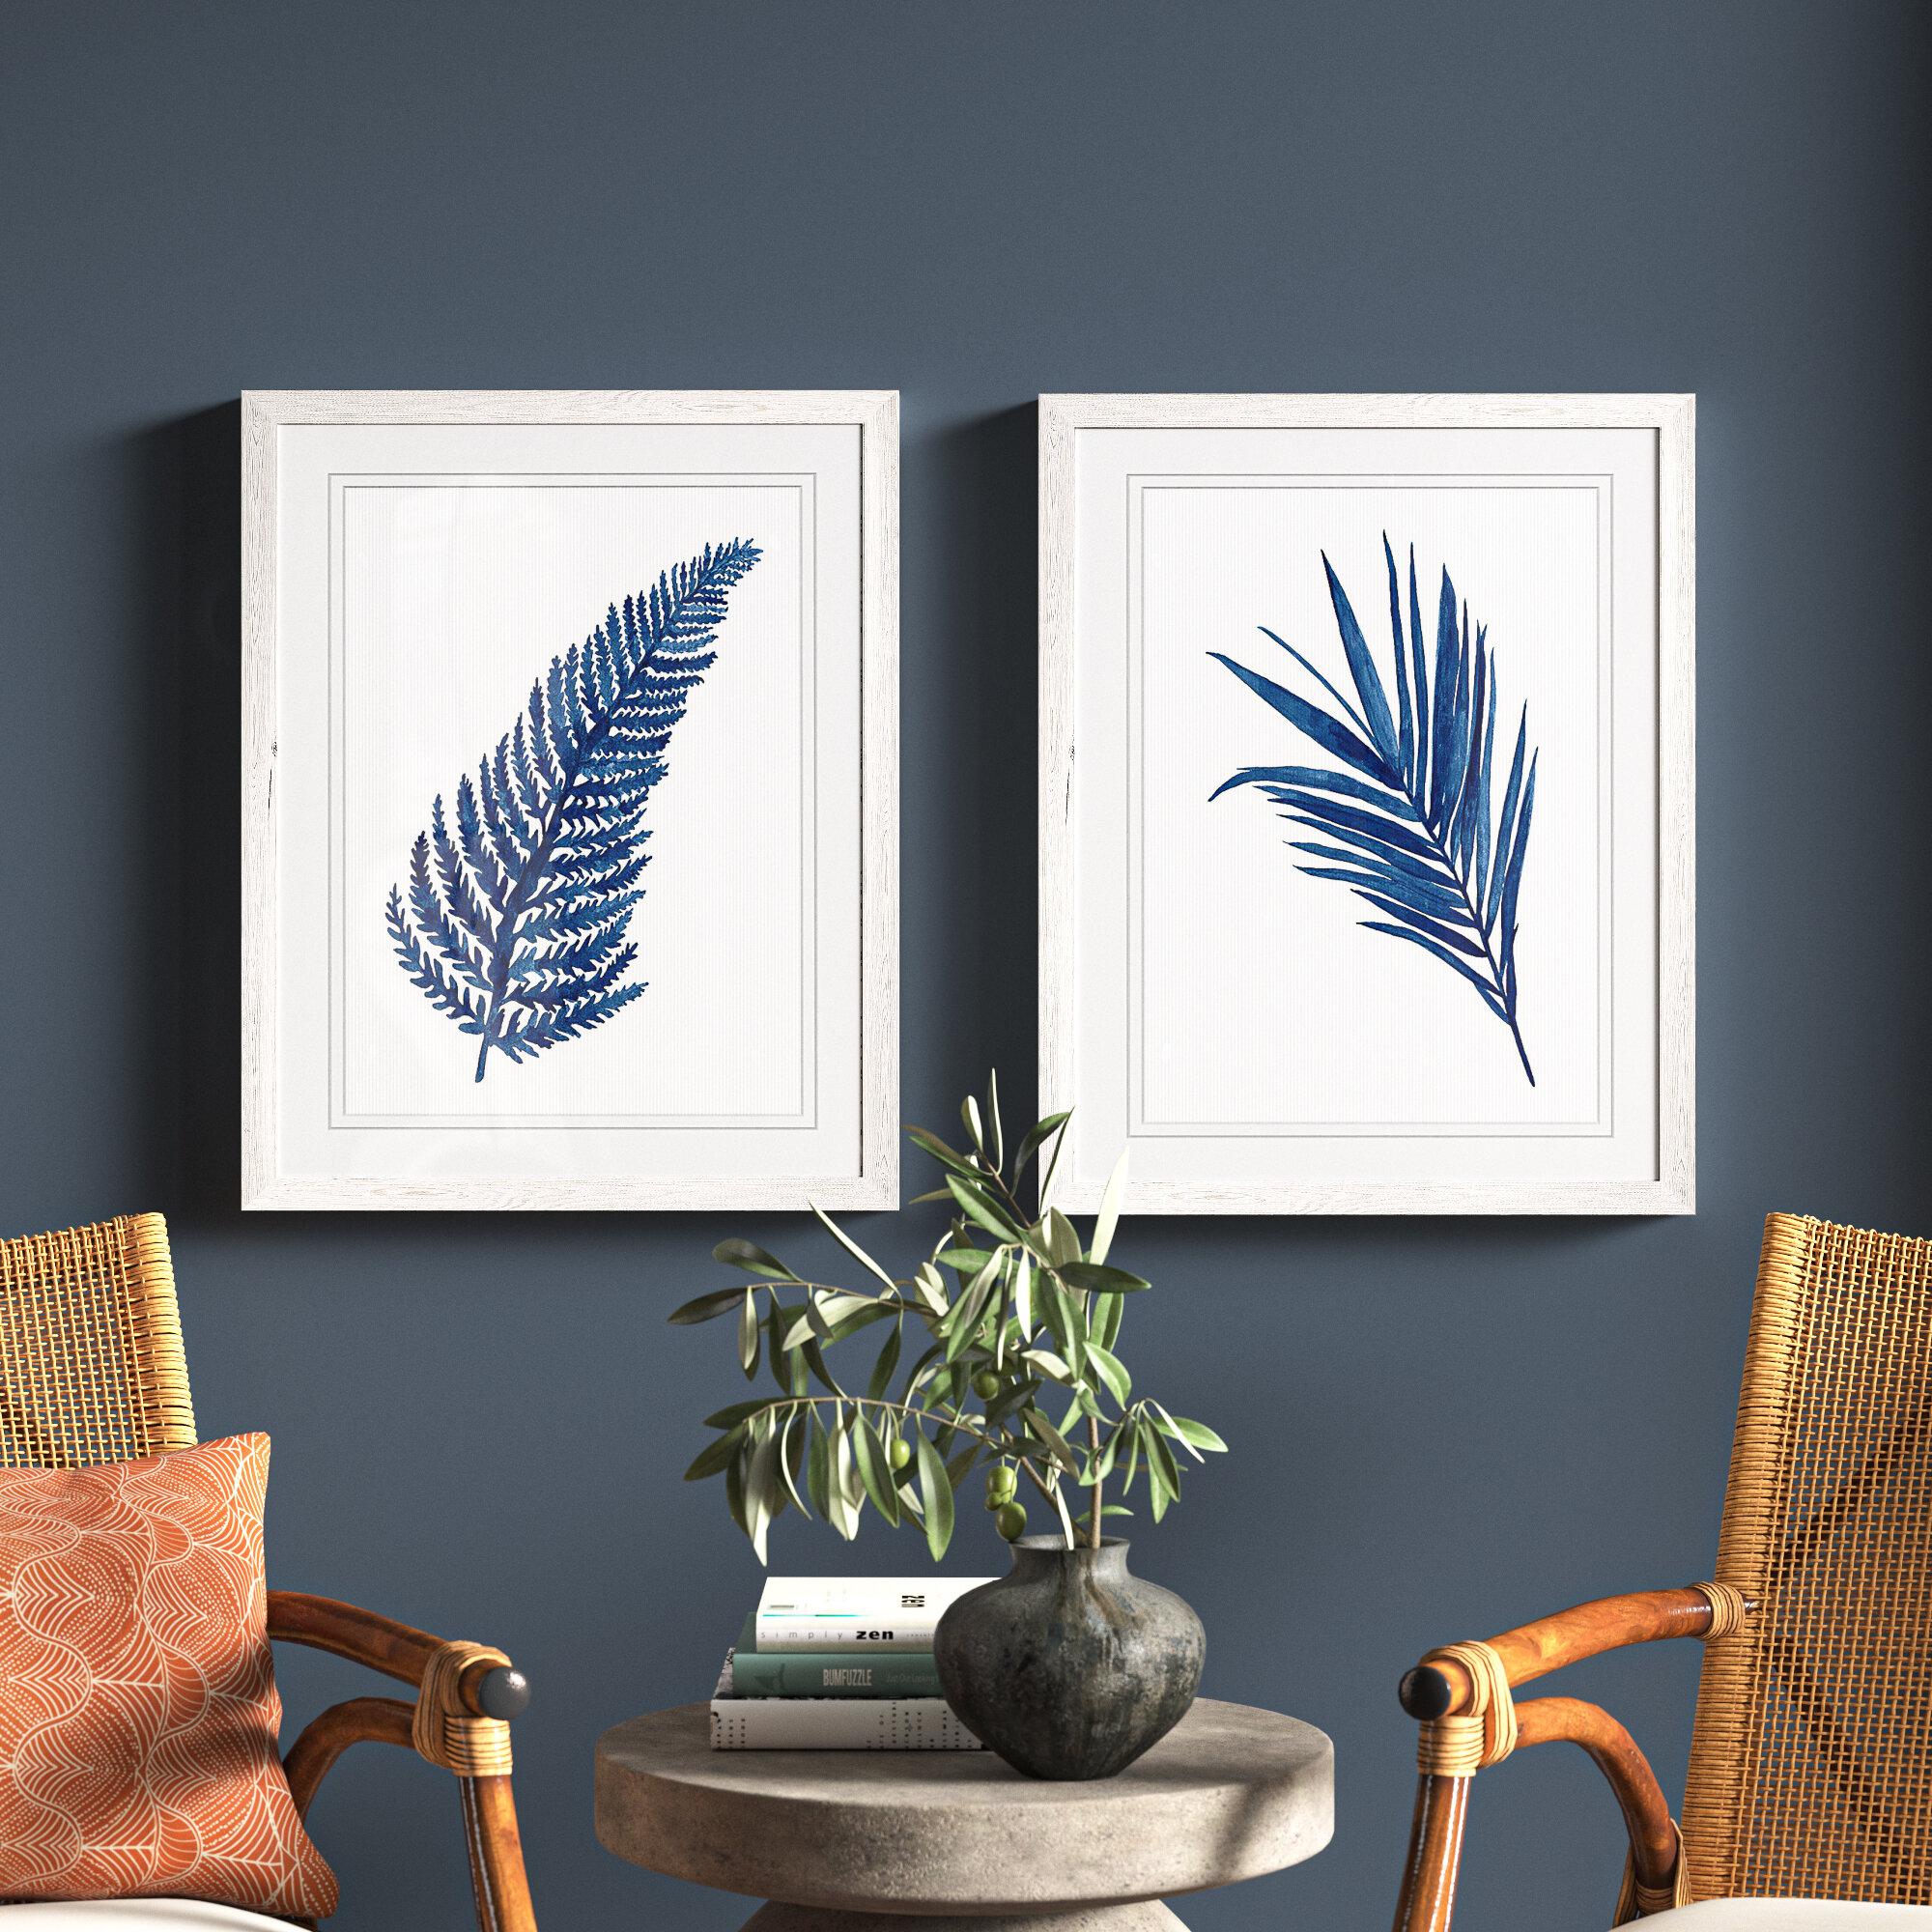 Bay Isle Home Indigo Botanica Iii By Vincent Van Gogh 2 Piece Picture Frame Painting Print Set Reviews Wayfair